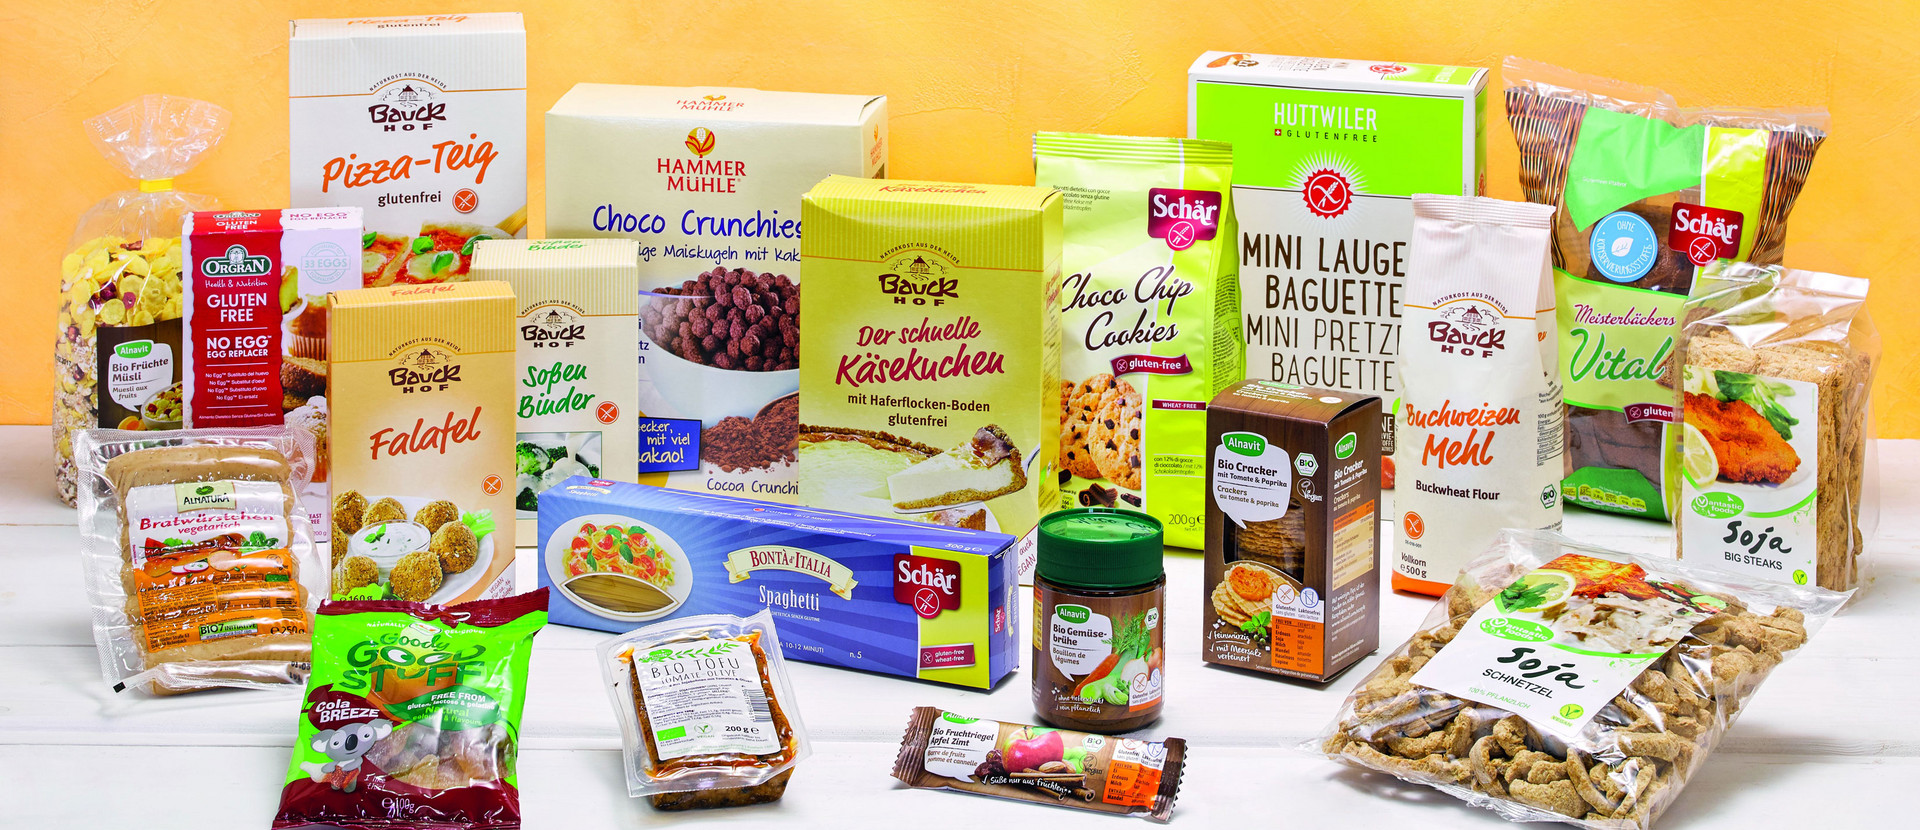 Produkte aus dem glutenfreien Lebensmittelsortiment